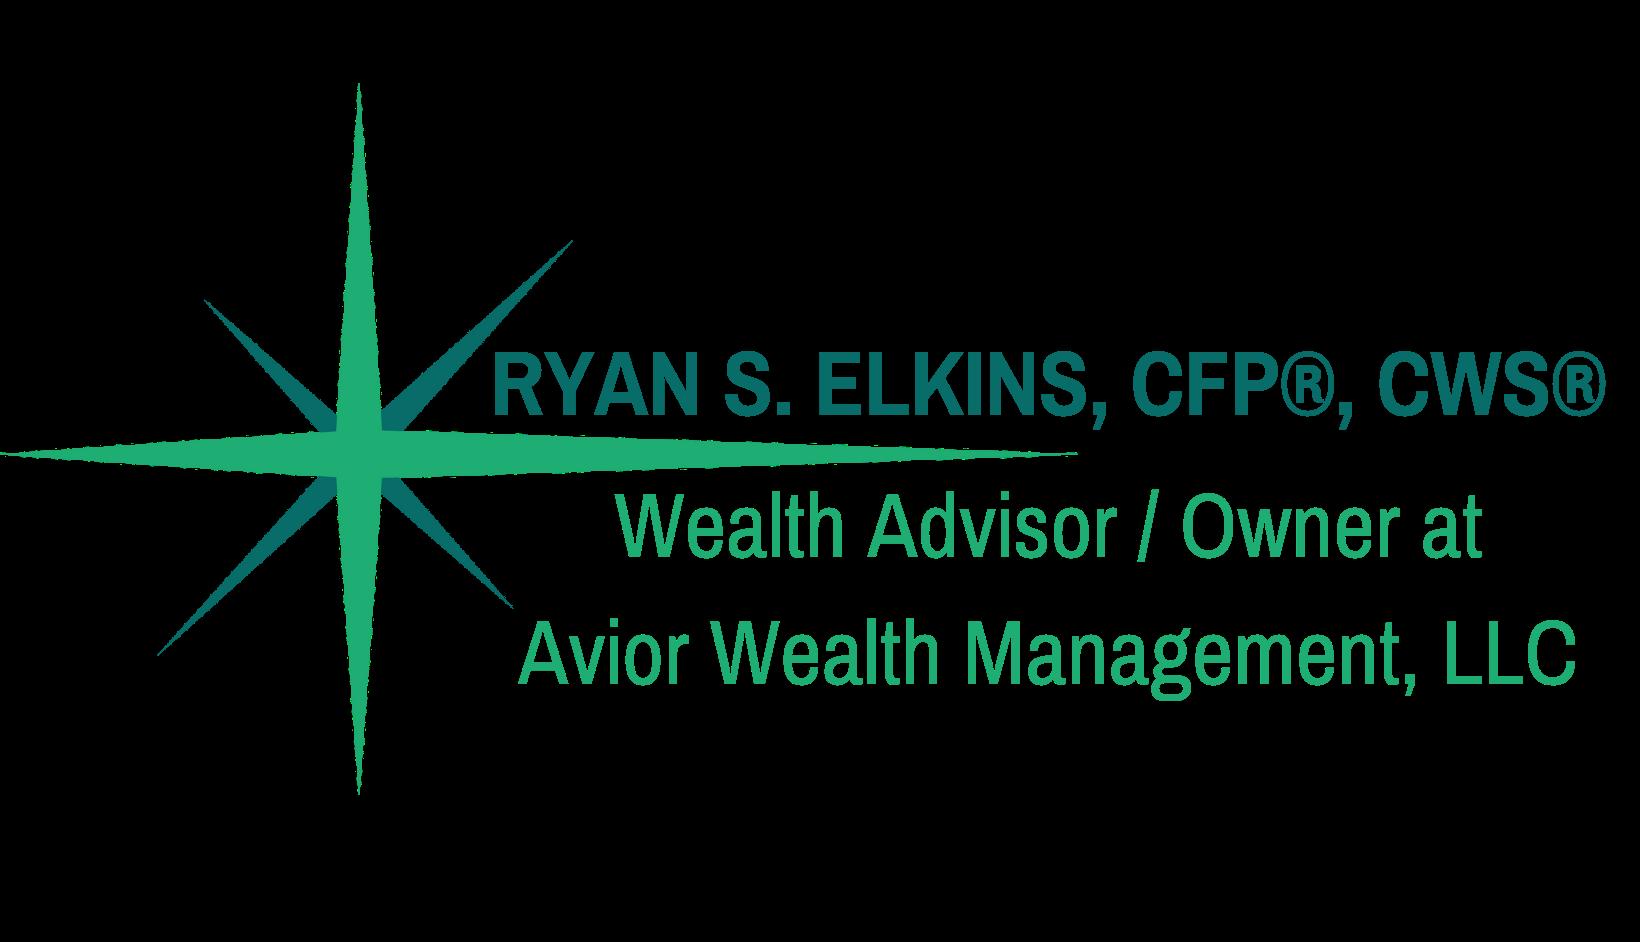 Logo for Avior Wealth Management, LLC